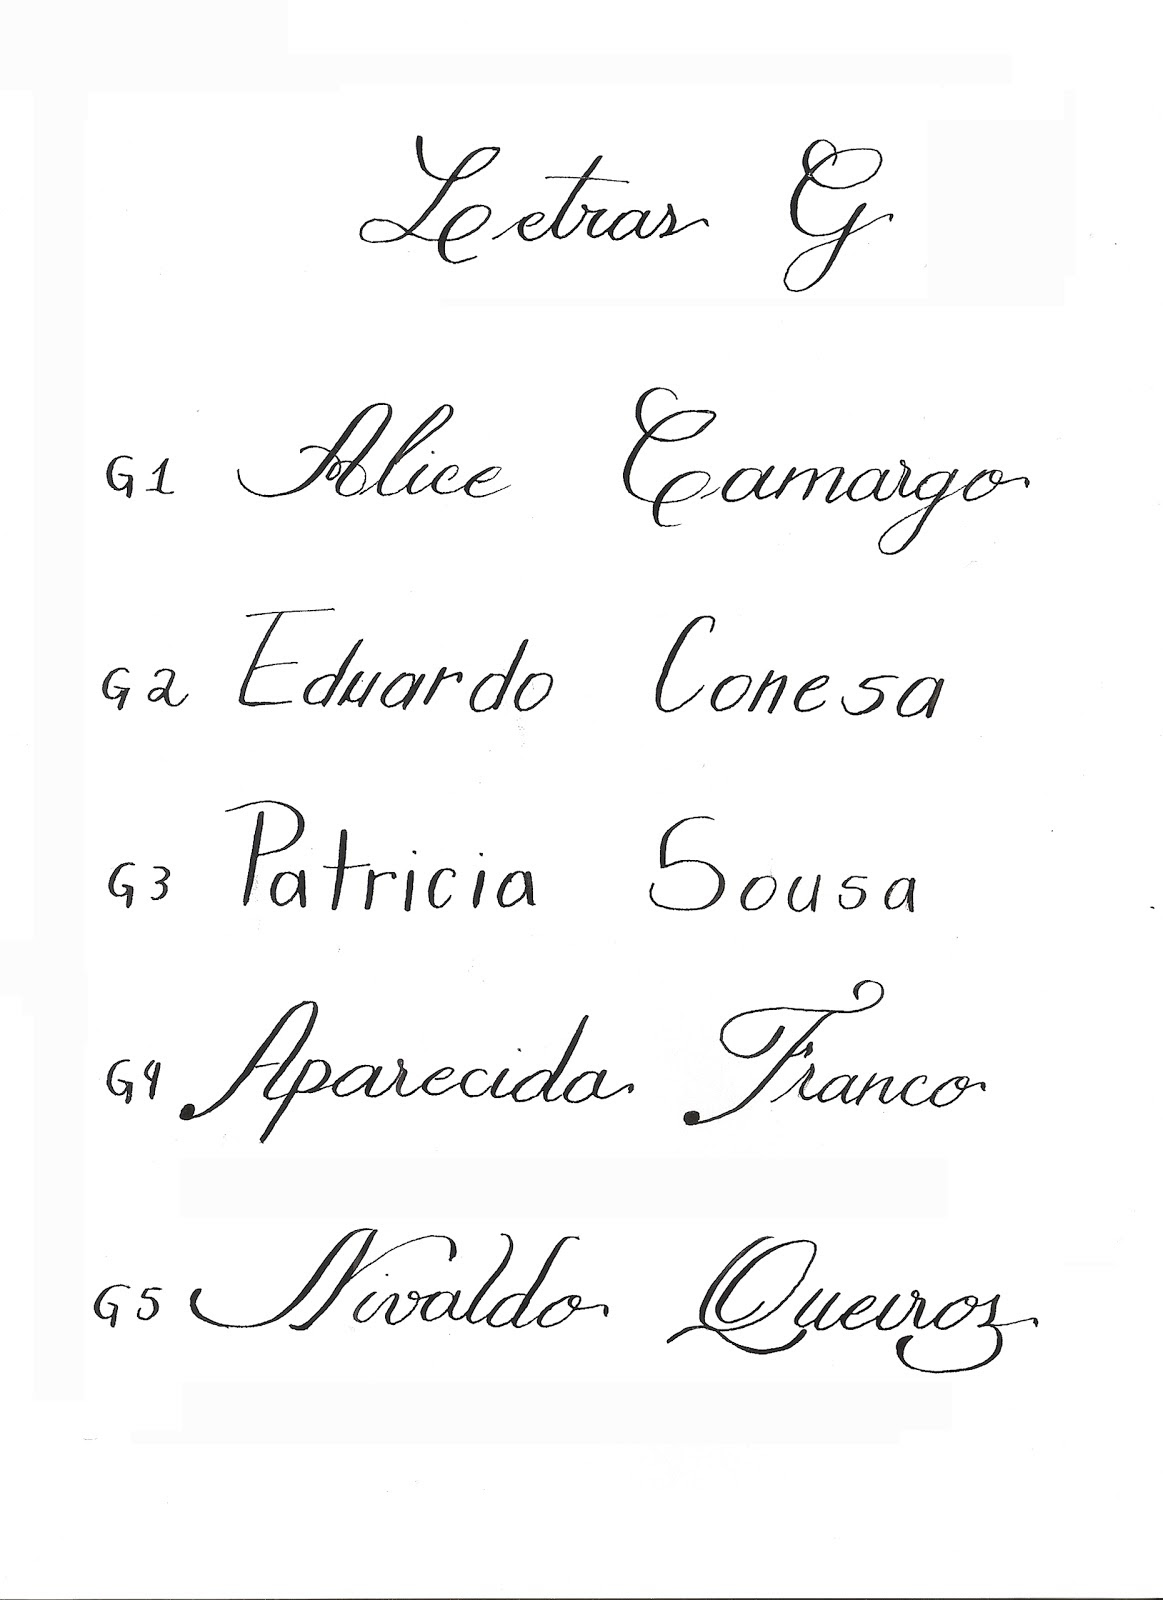 Tipos De Letras Para Nombres En Tatuajes Wwwacelesitecom